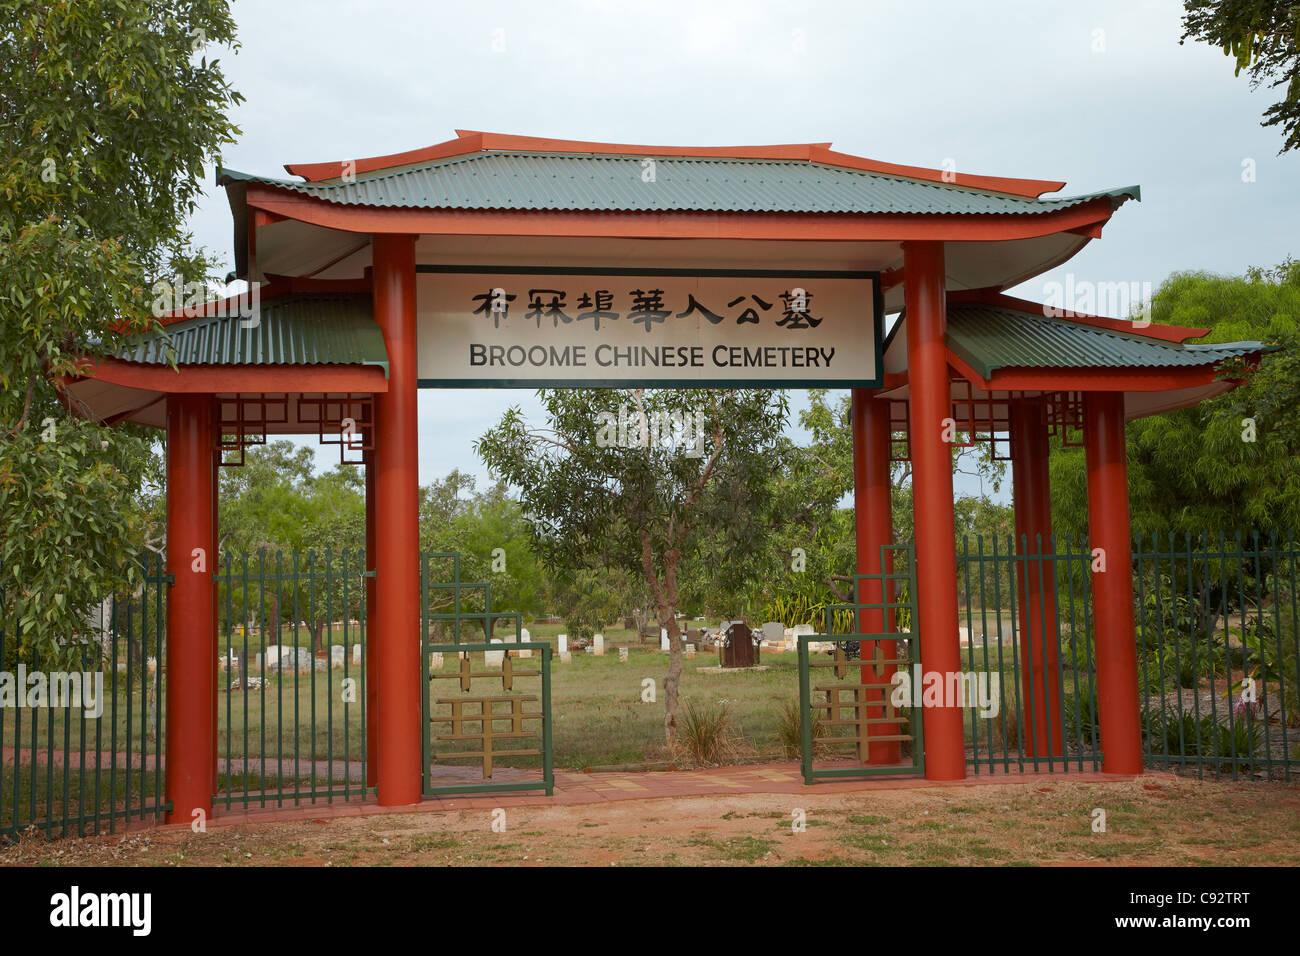 Broome Chinese Cemetery, Broome, Kimberley Region, Western Australia, Australia - Stock Image